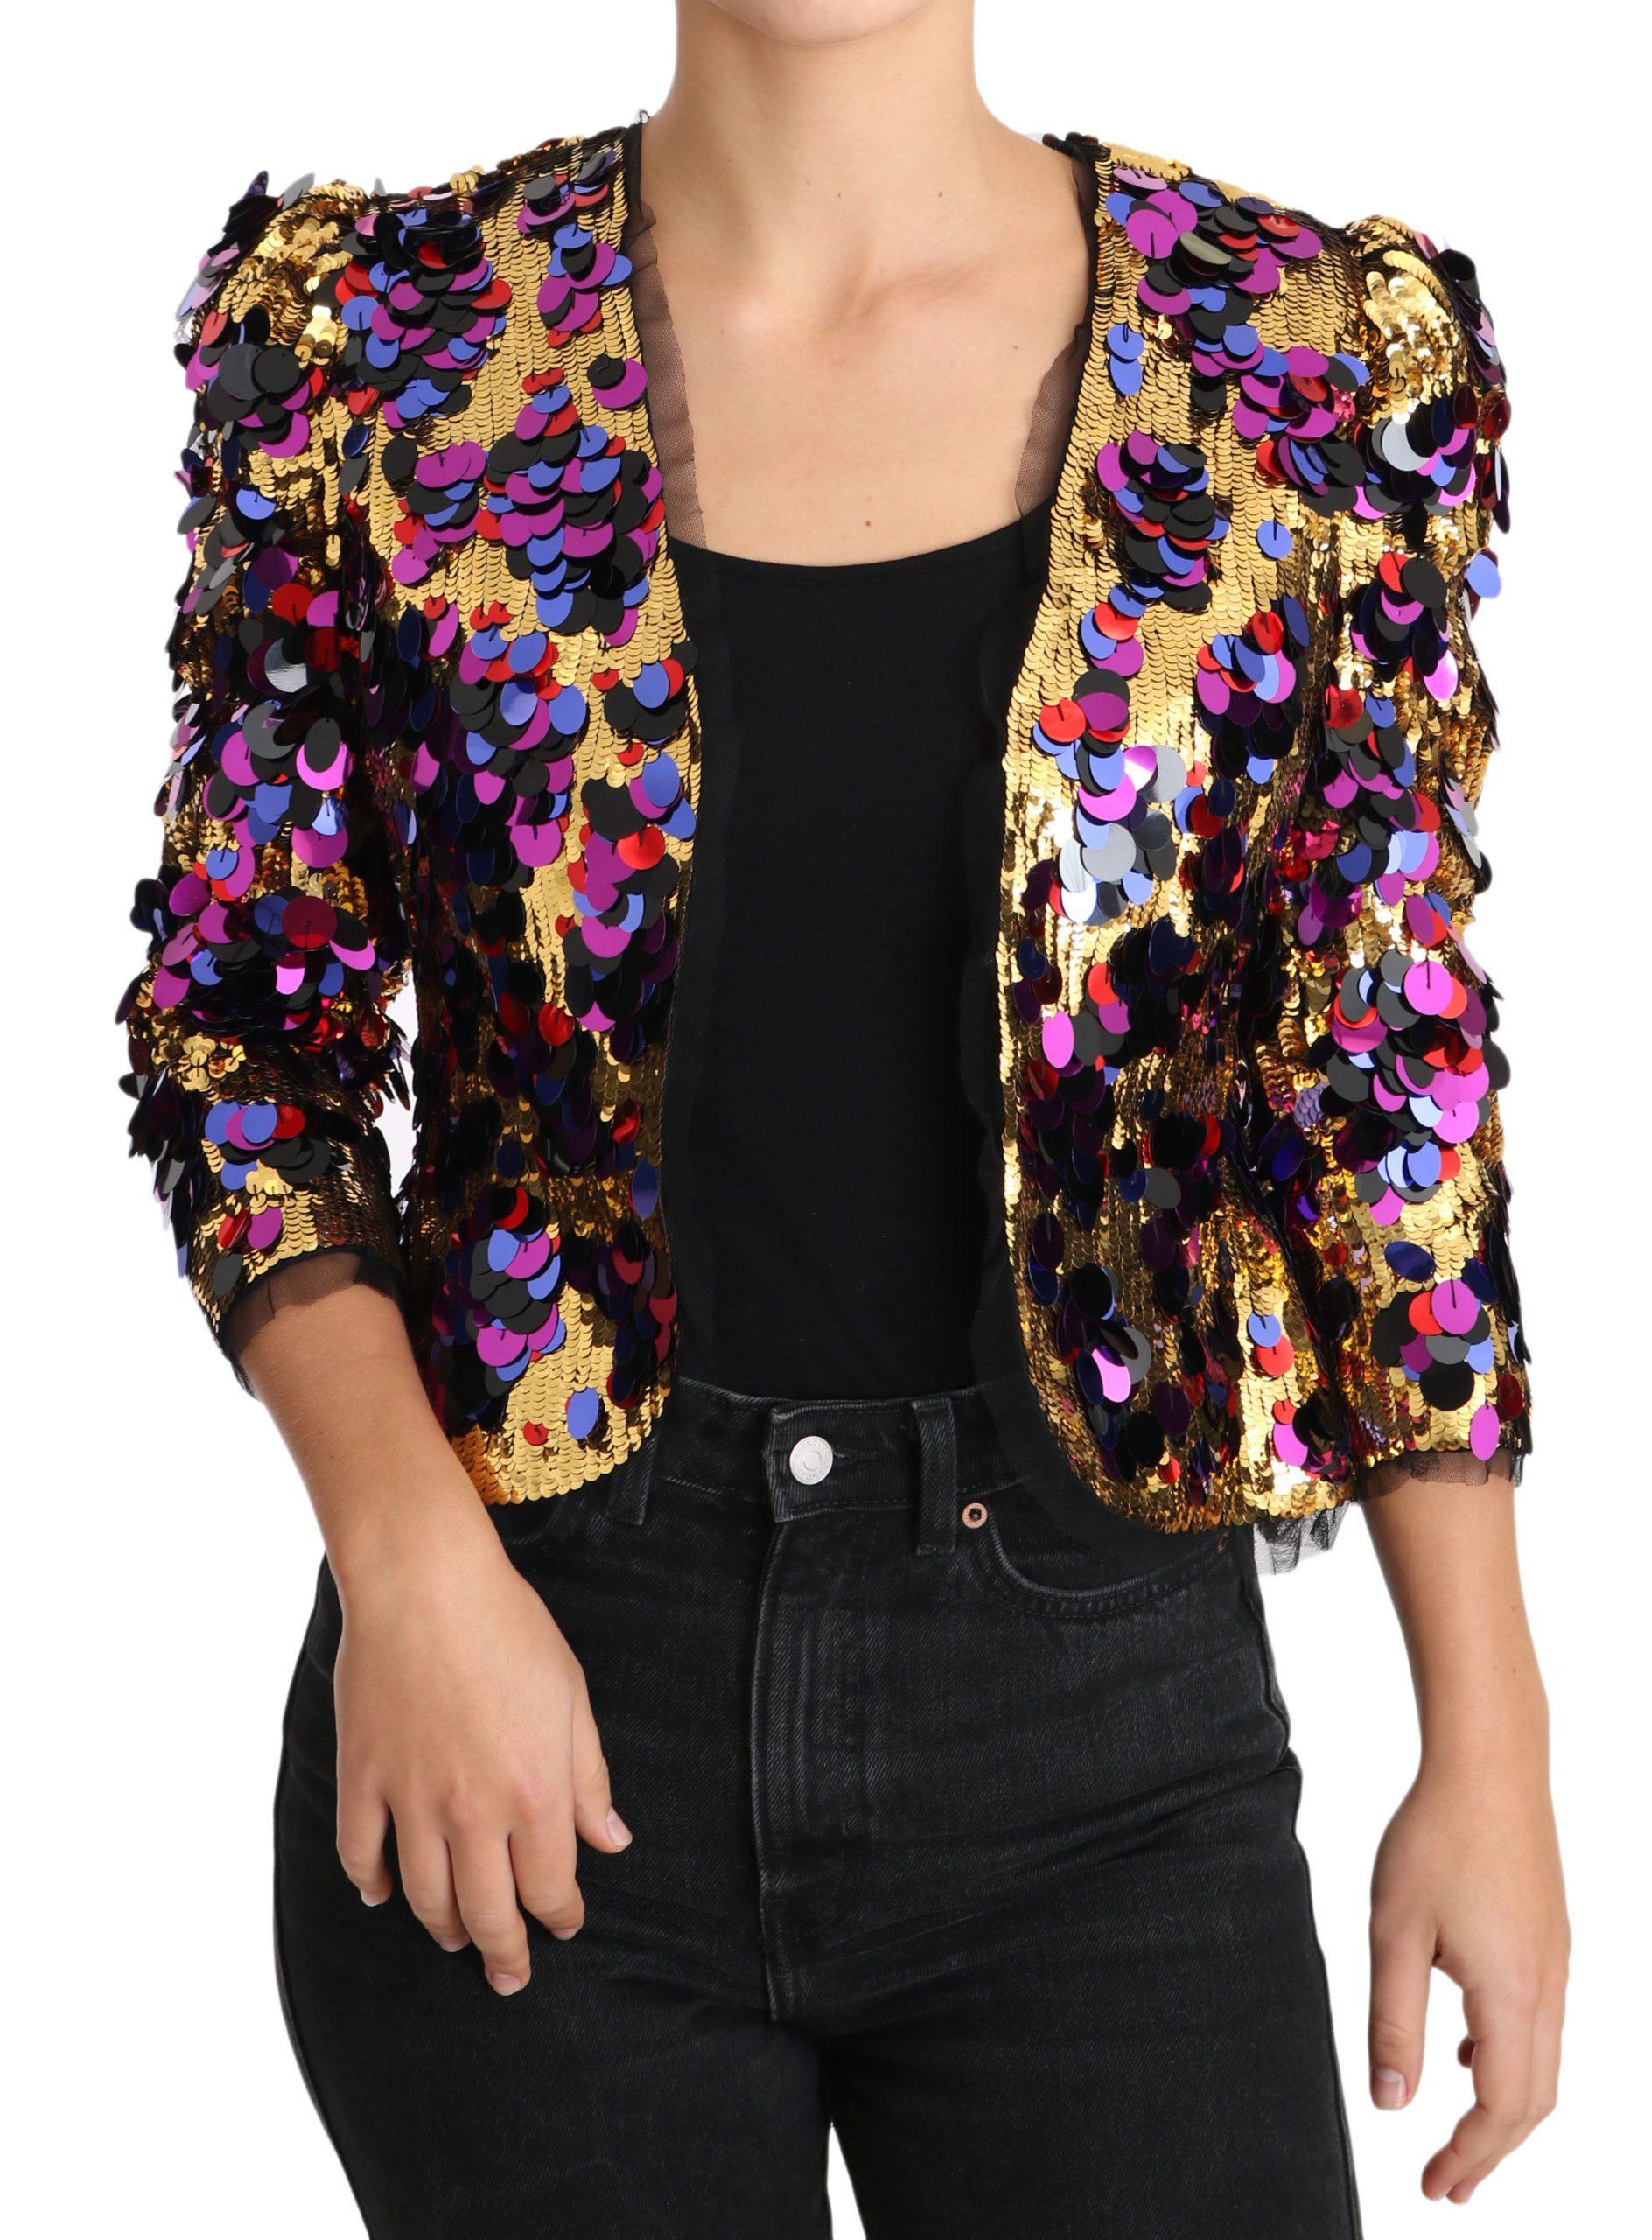 Dolce & Gabbana Women's Sequined Blazer Jacket Gold JKT2421 - IT40 S